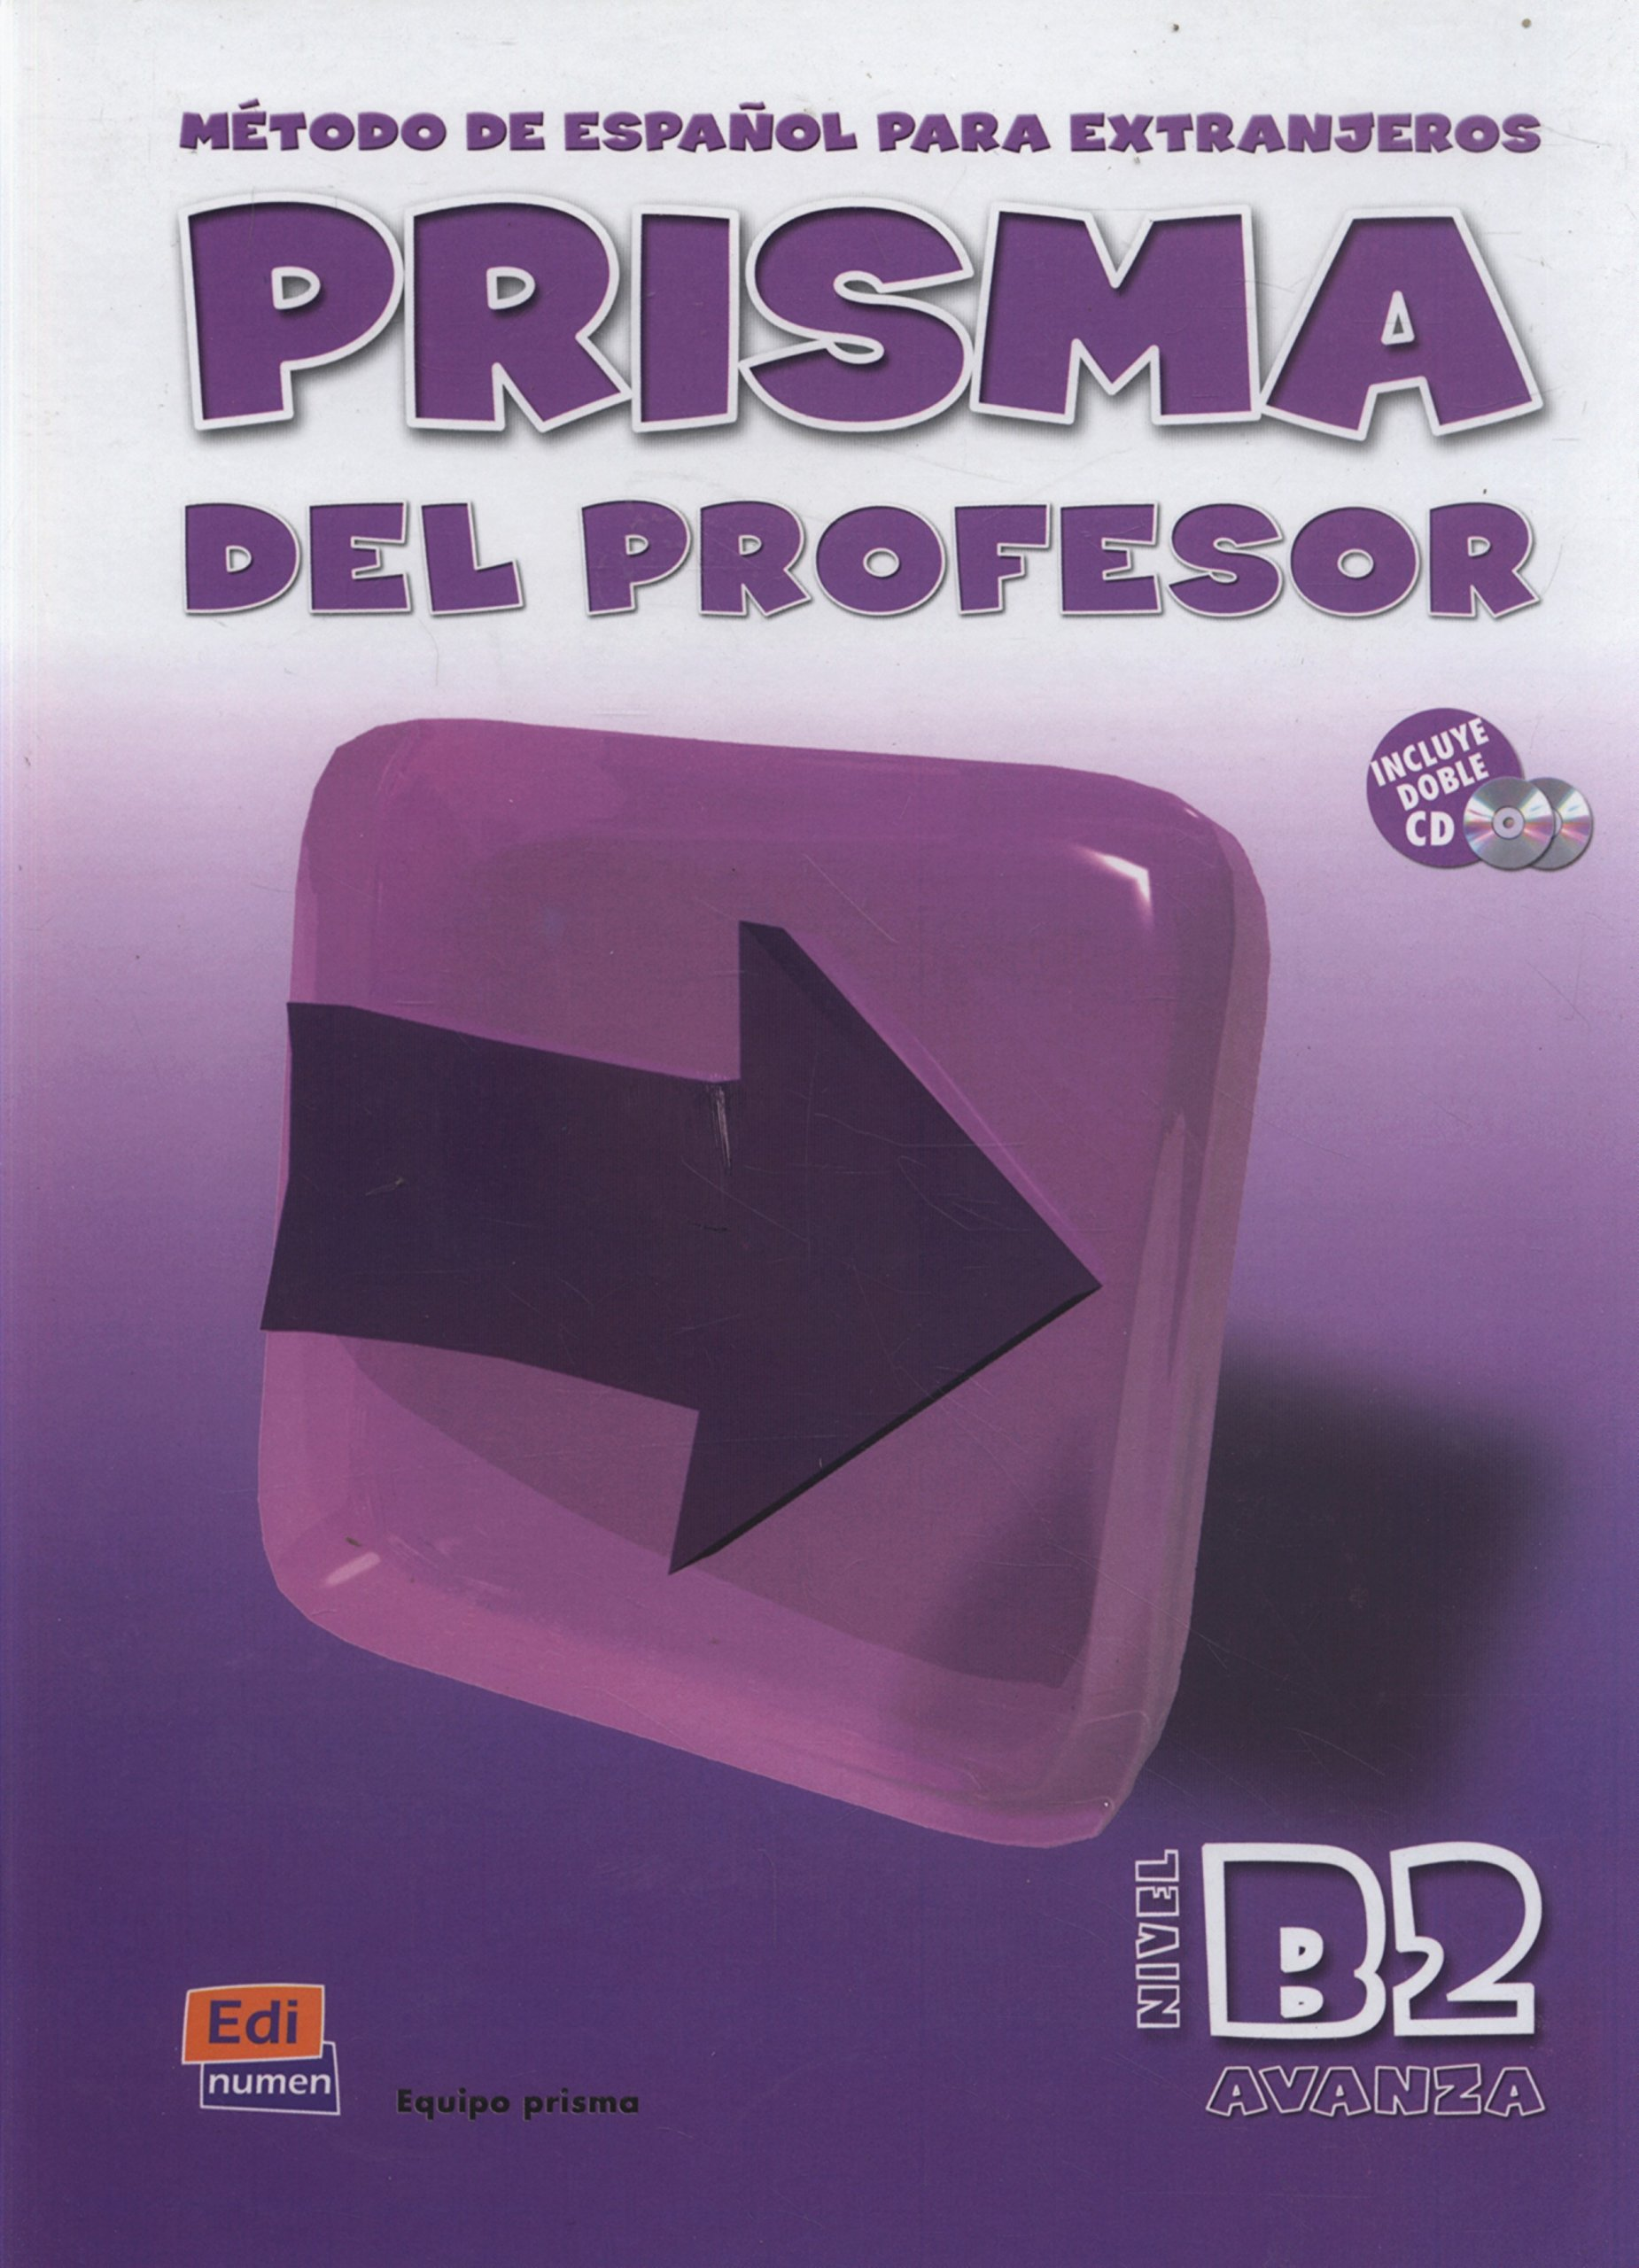 Prisma B2 Avanza, Del Profesor / Prisma B2 Avanza, For the Professor: Metodo de Espanol para Extranjeros / Method of Spanish for Foreigners (Spanish Edition) pdf epub